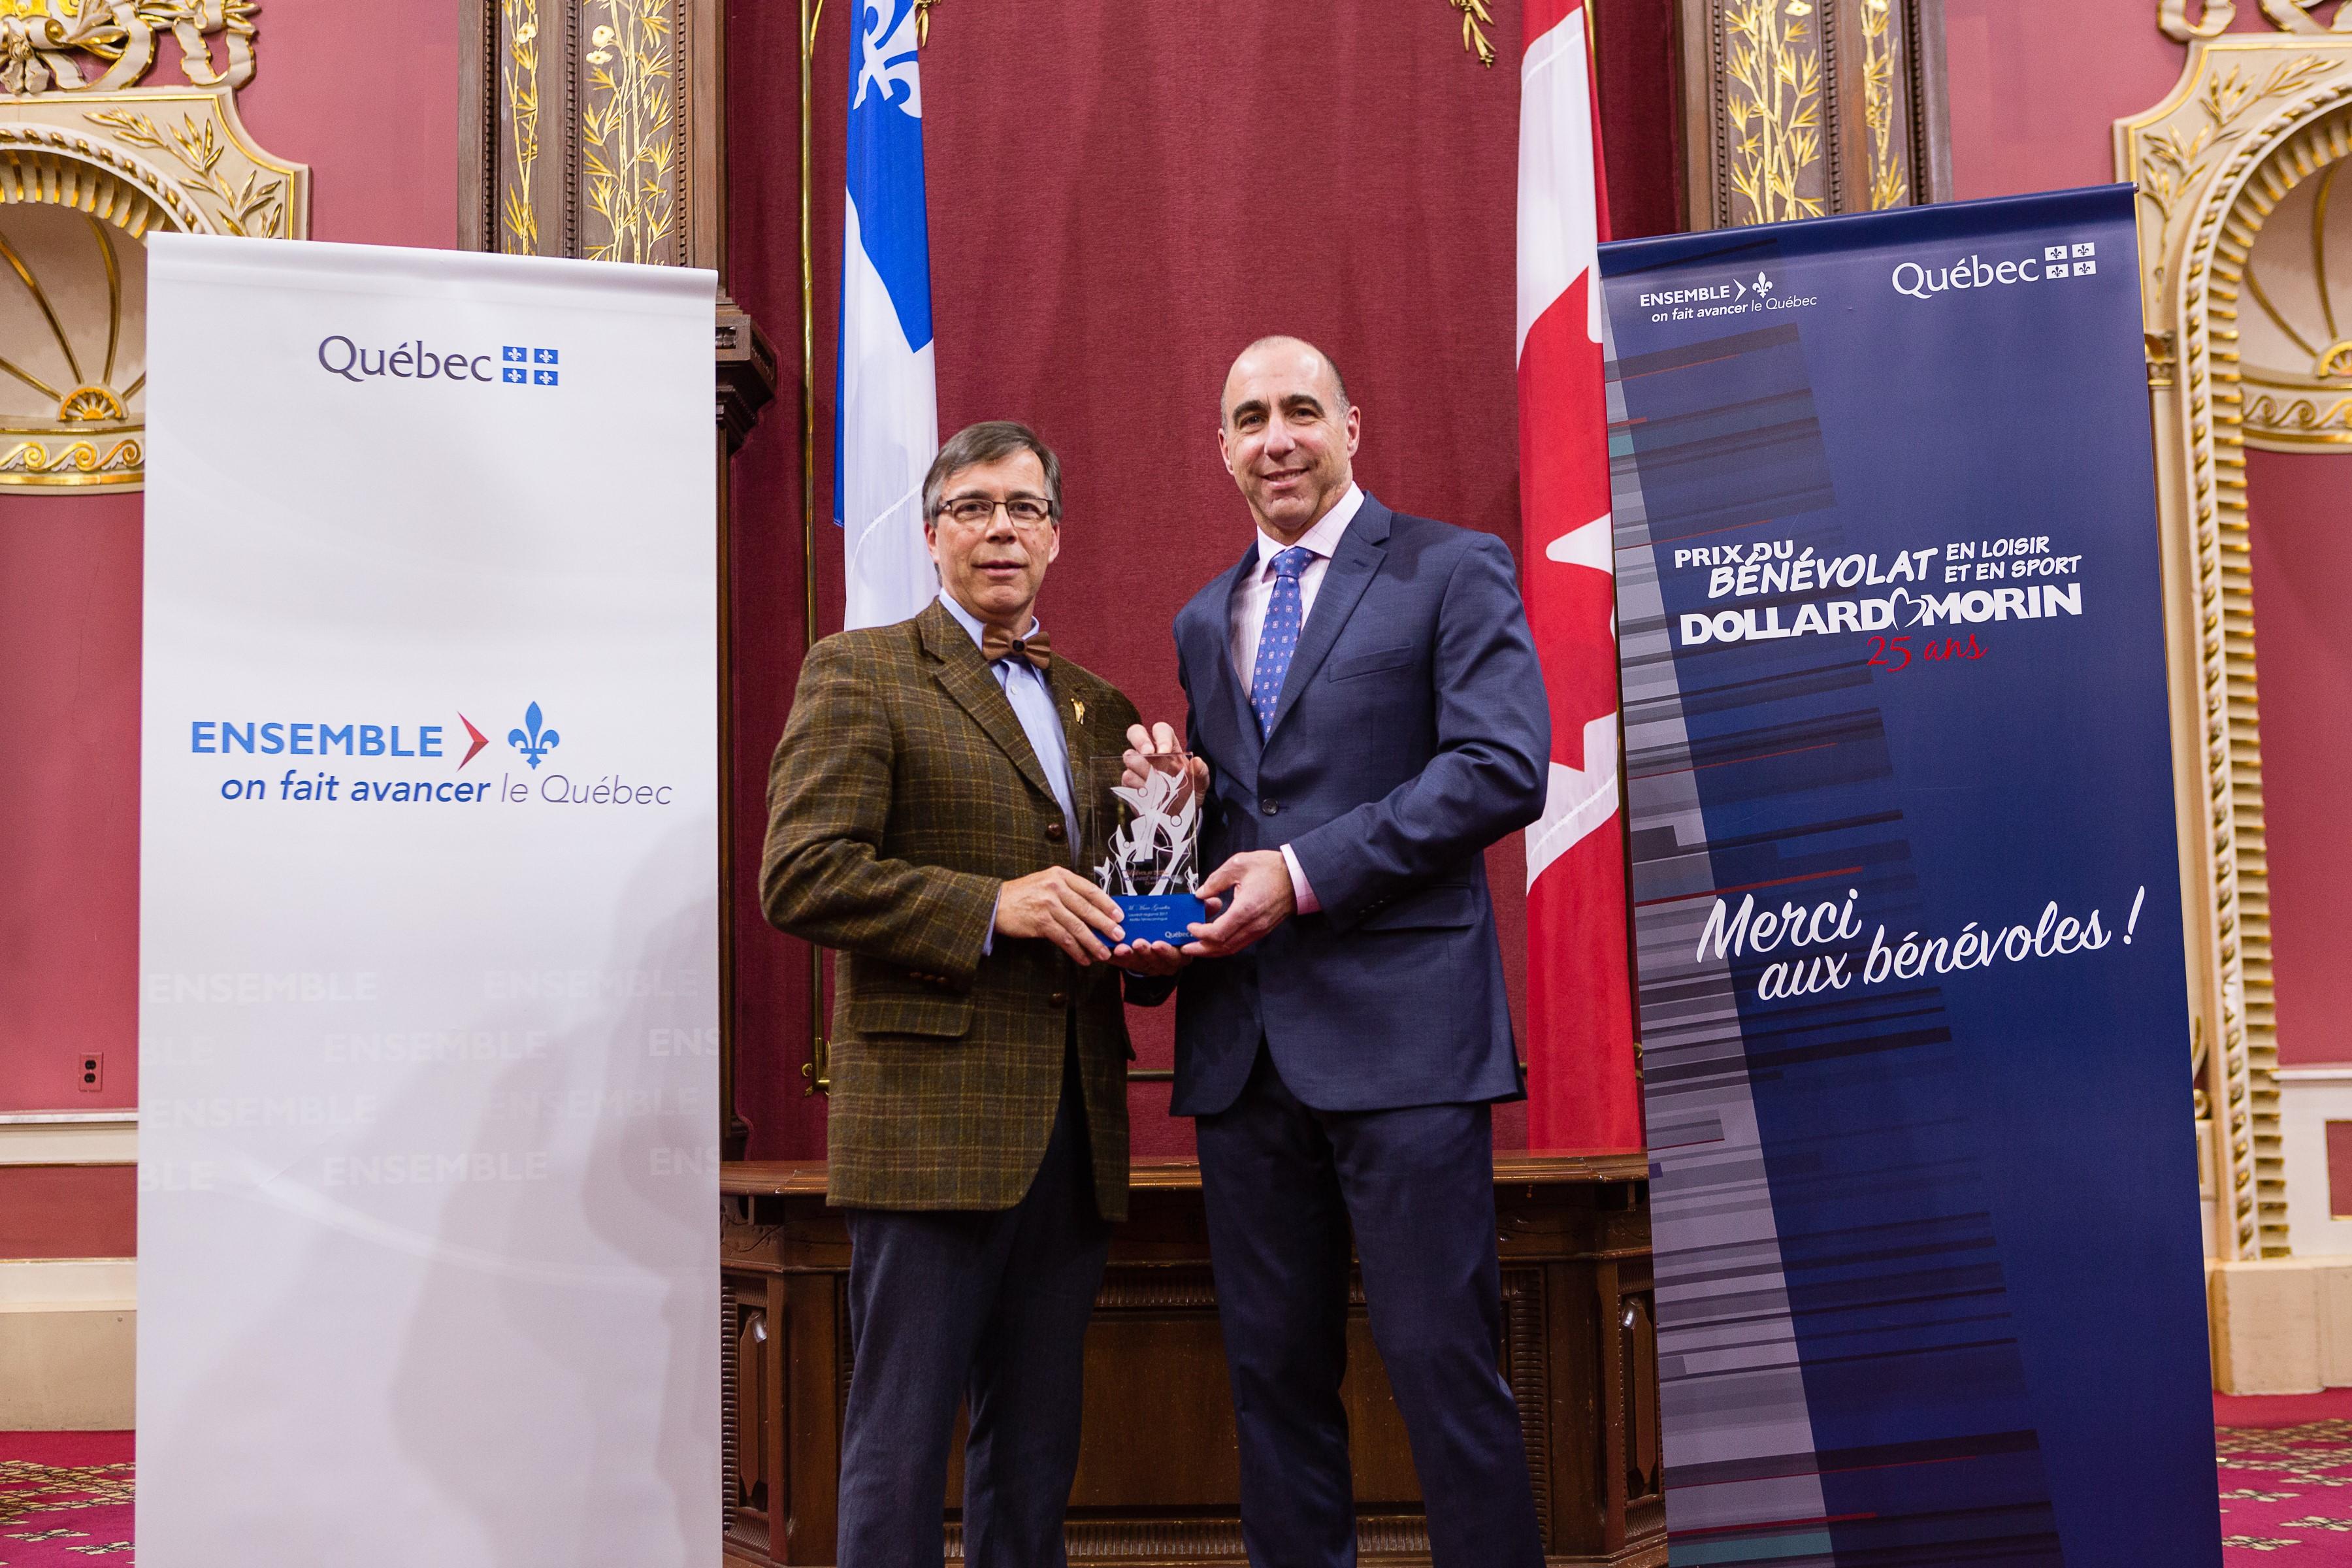 Prix du bénévolat en loisir et en sport Dollard-Morin 2017